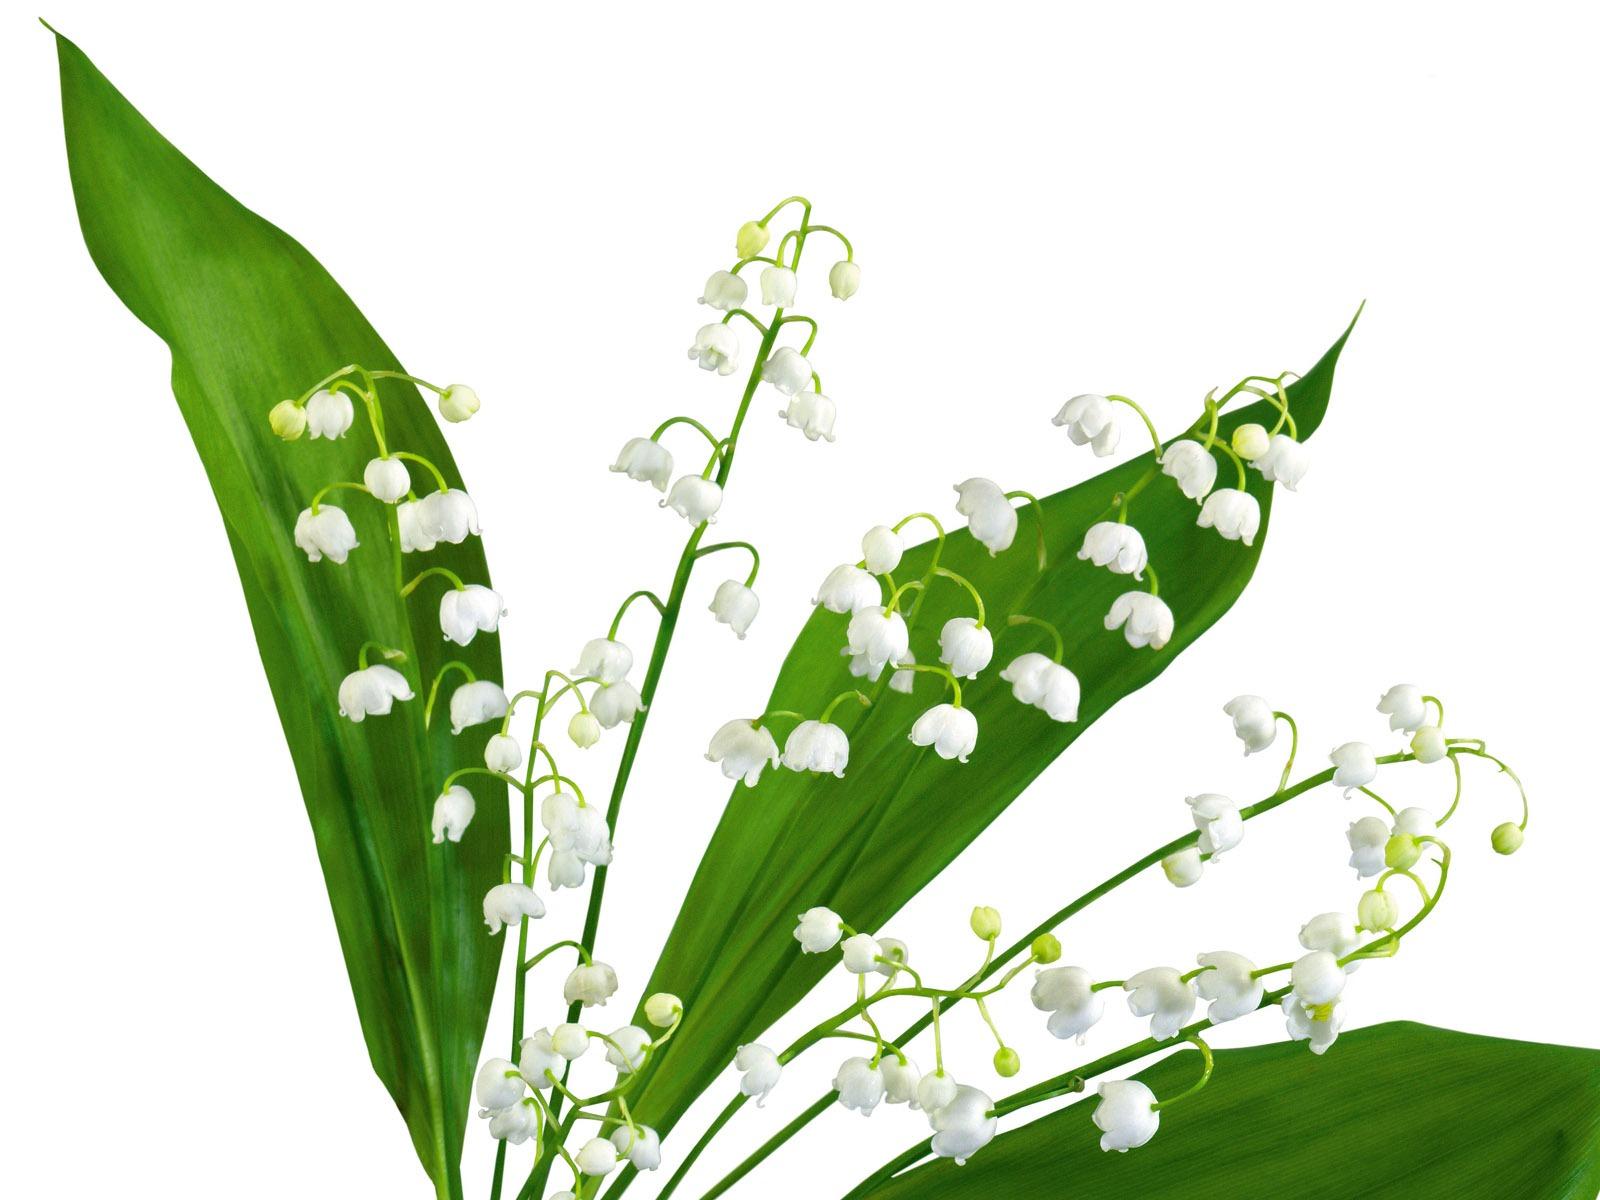 ... Blumen Wallpaper - Pflanzen Hintergrundbilder - V3 Wallpaper Site